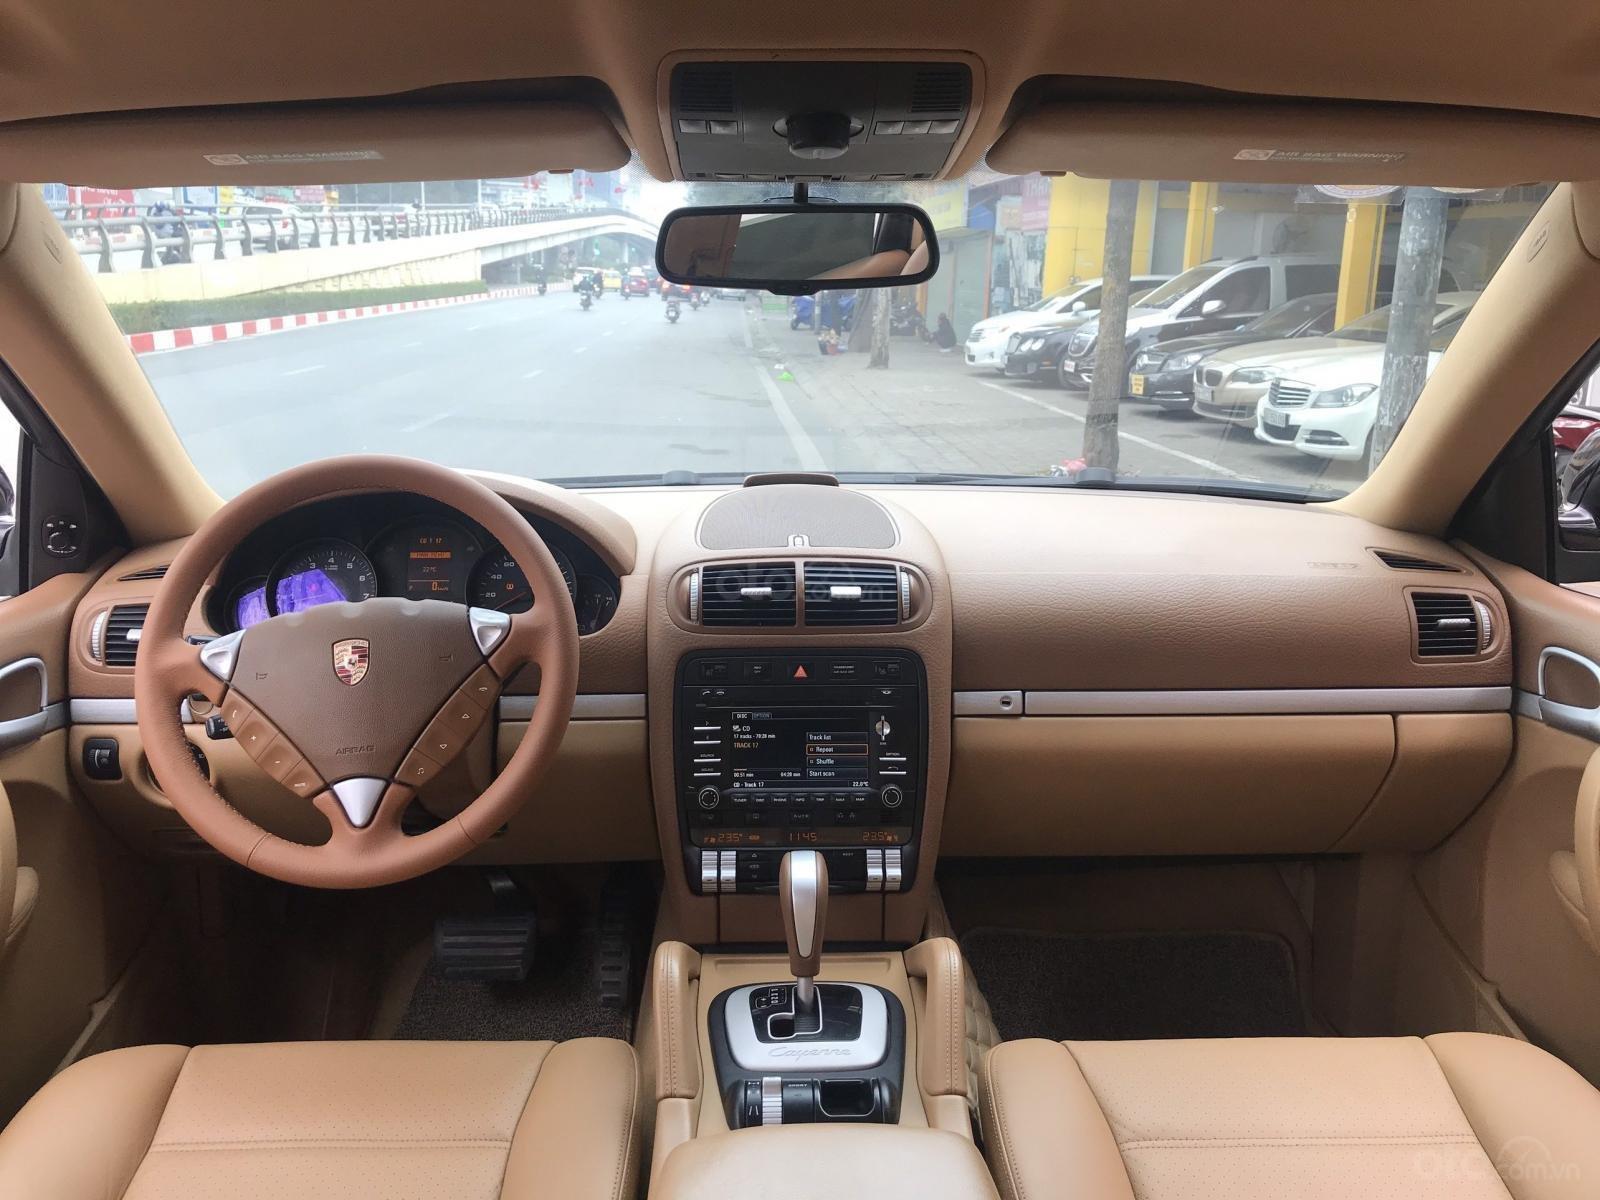 Bán Porsche Cayenne S sản xuất năm 2008 (4)